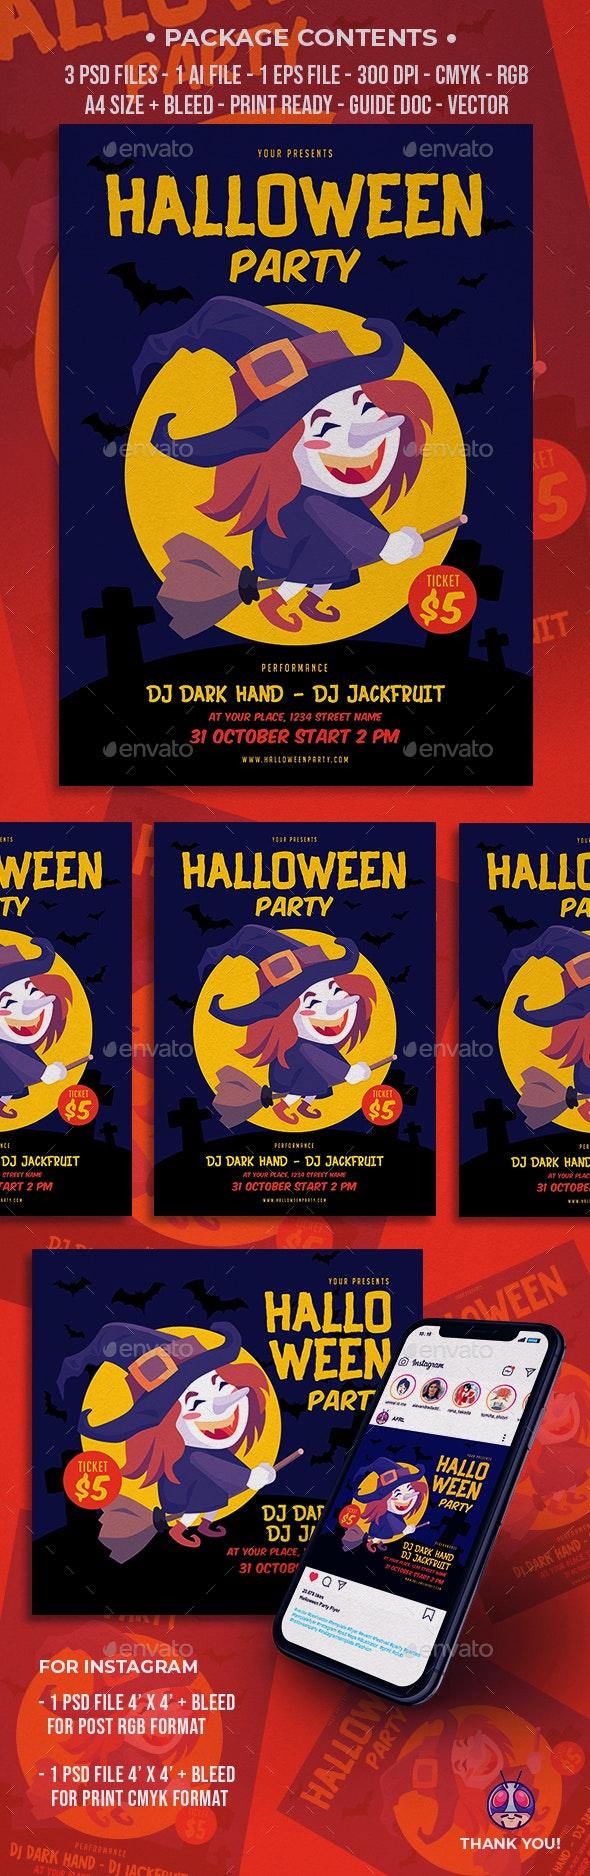 Halloween Party Flyer - Brochures Print Templates